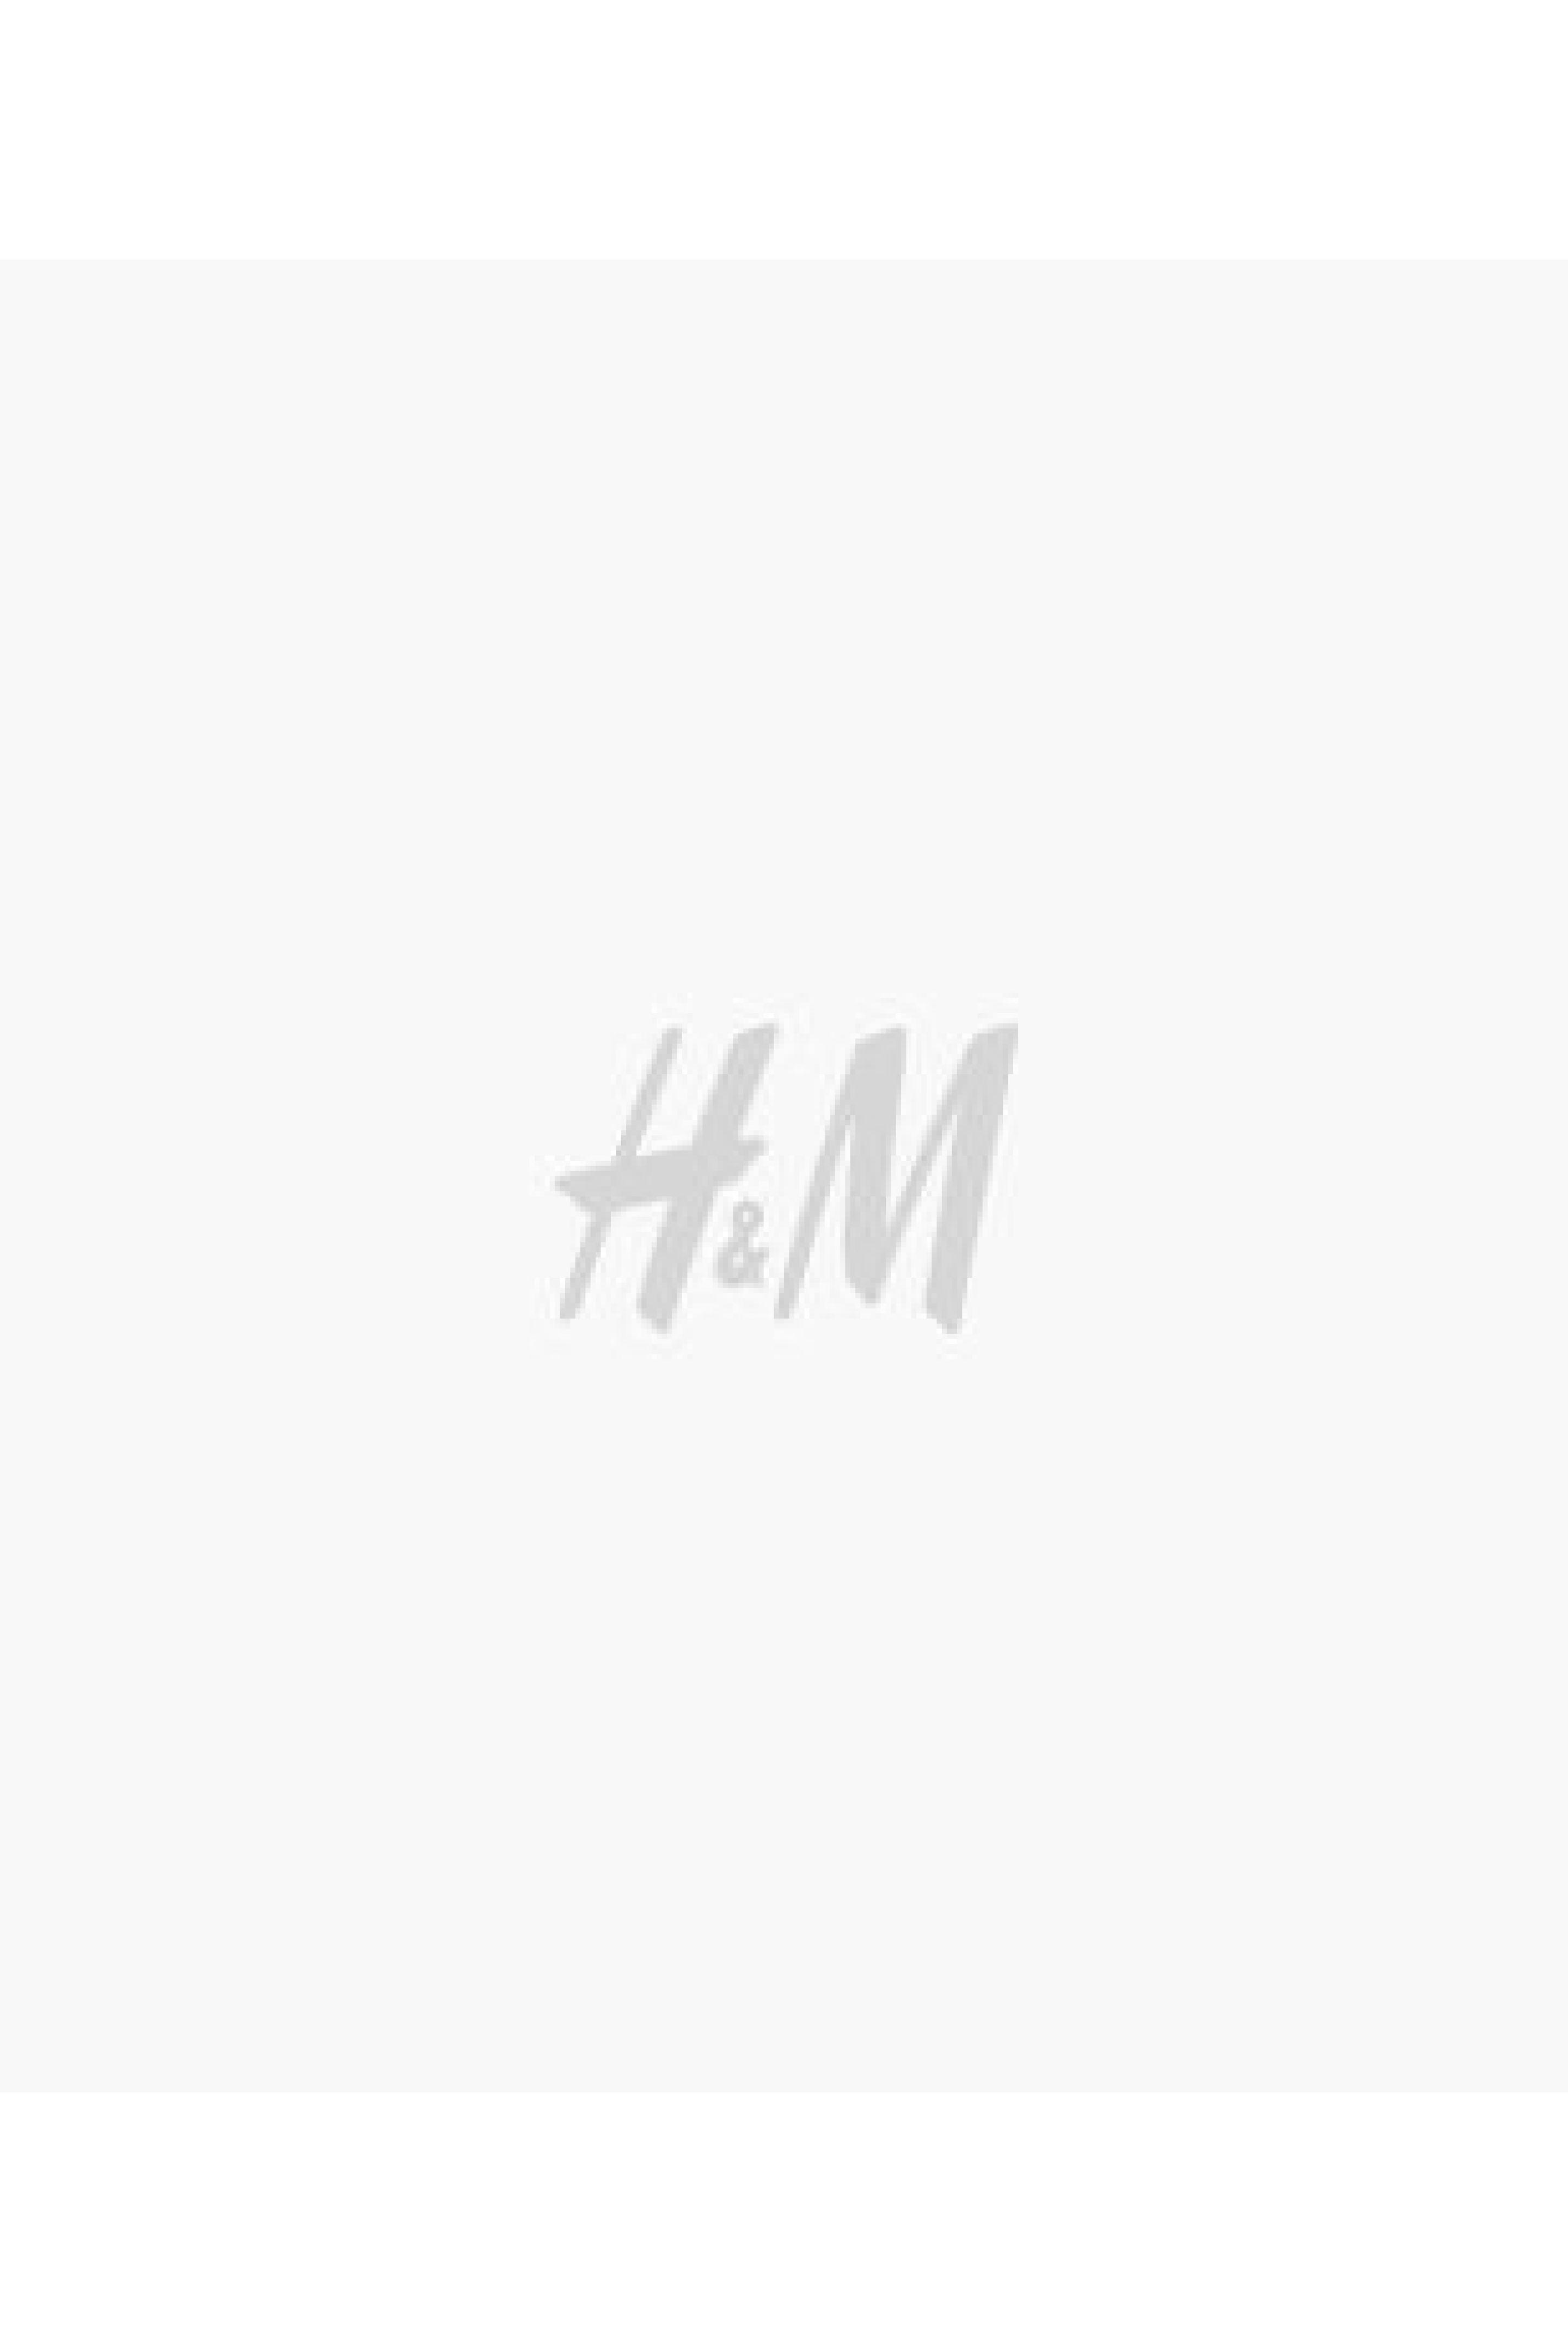 H&M Home - The Poppy Delevingne edit